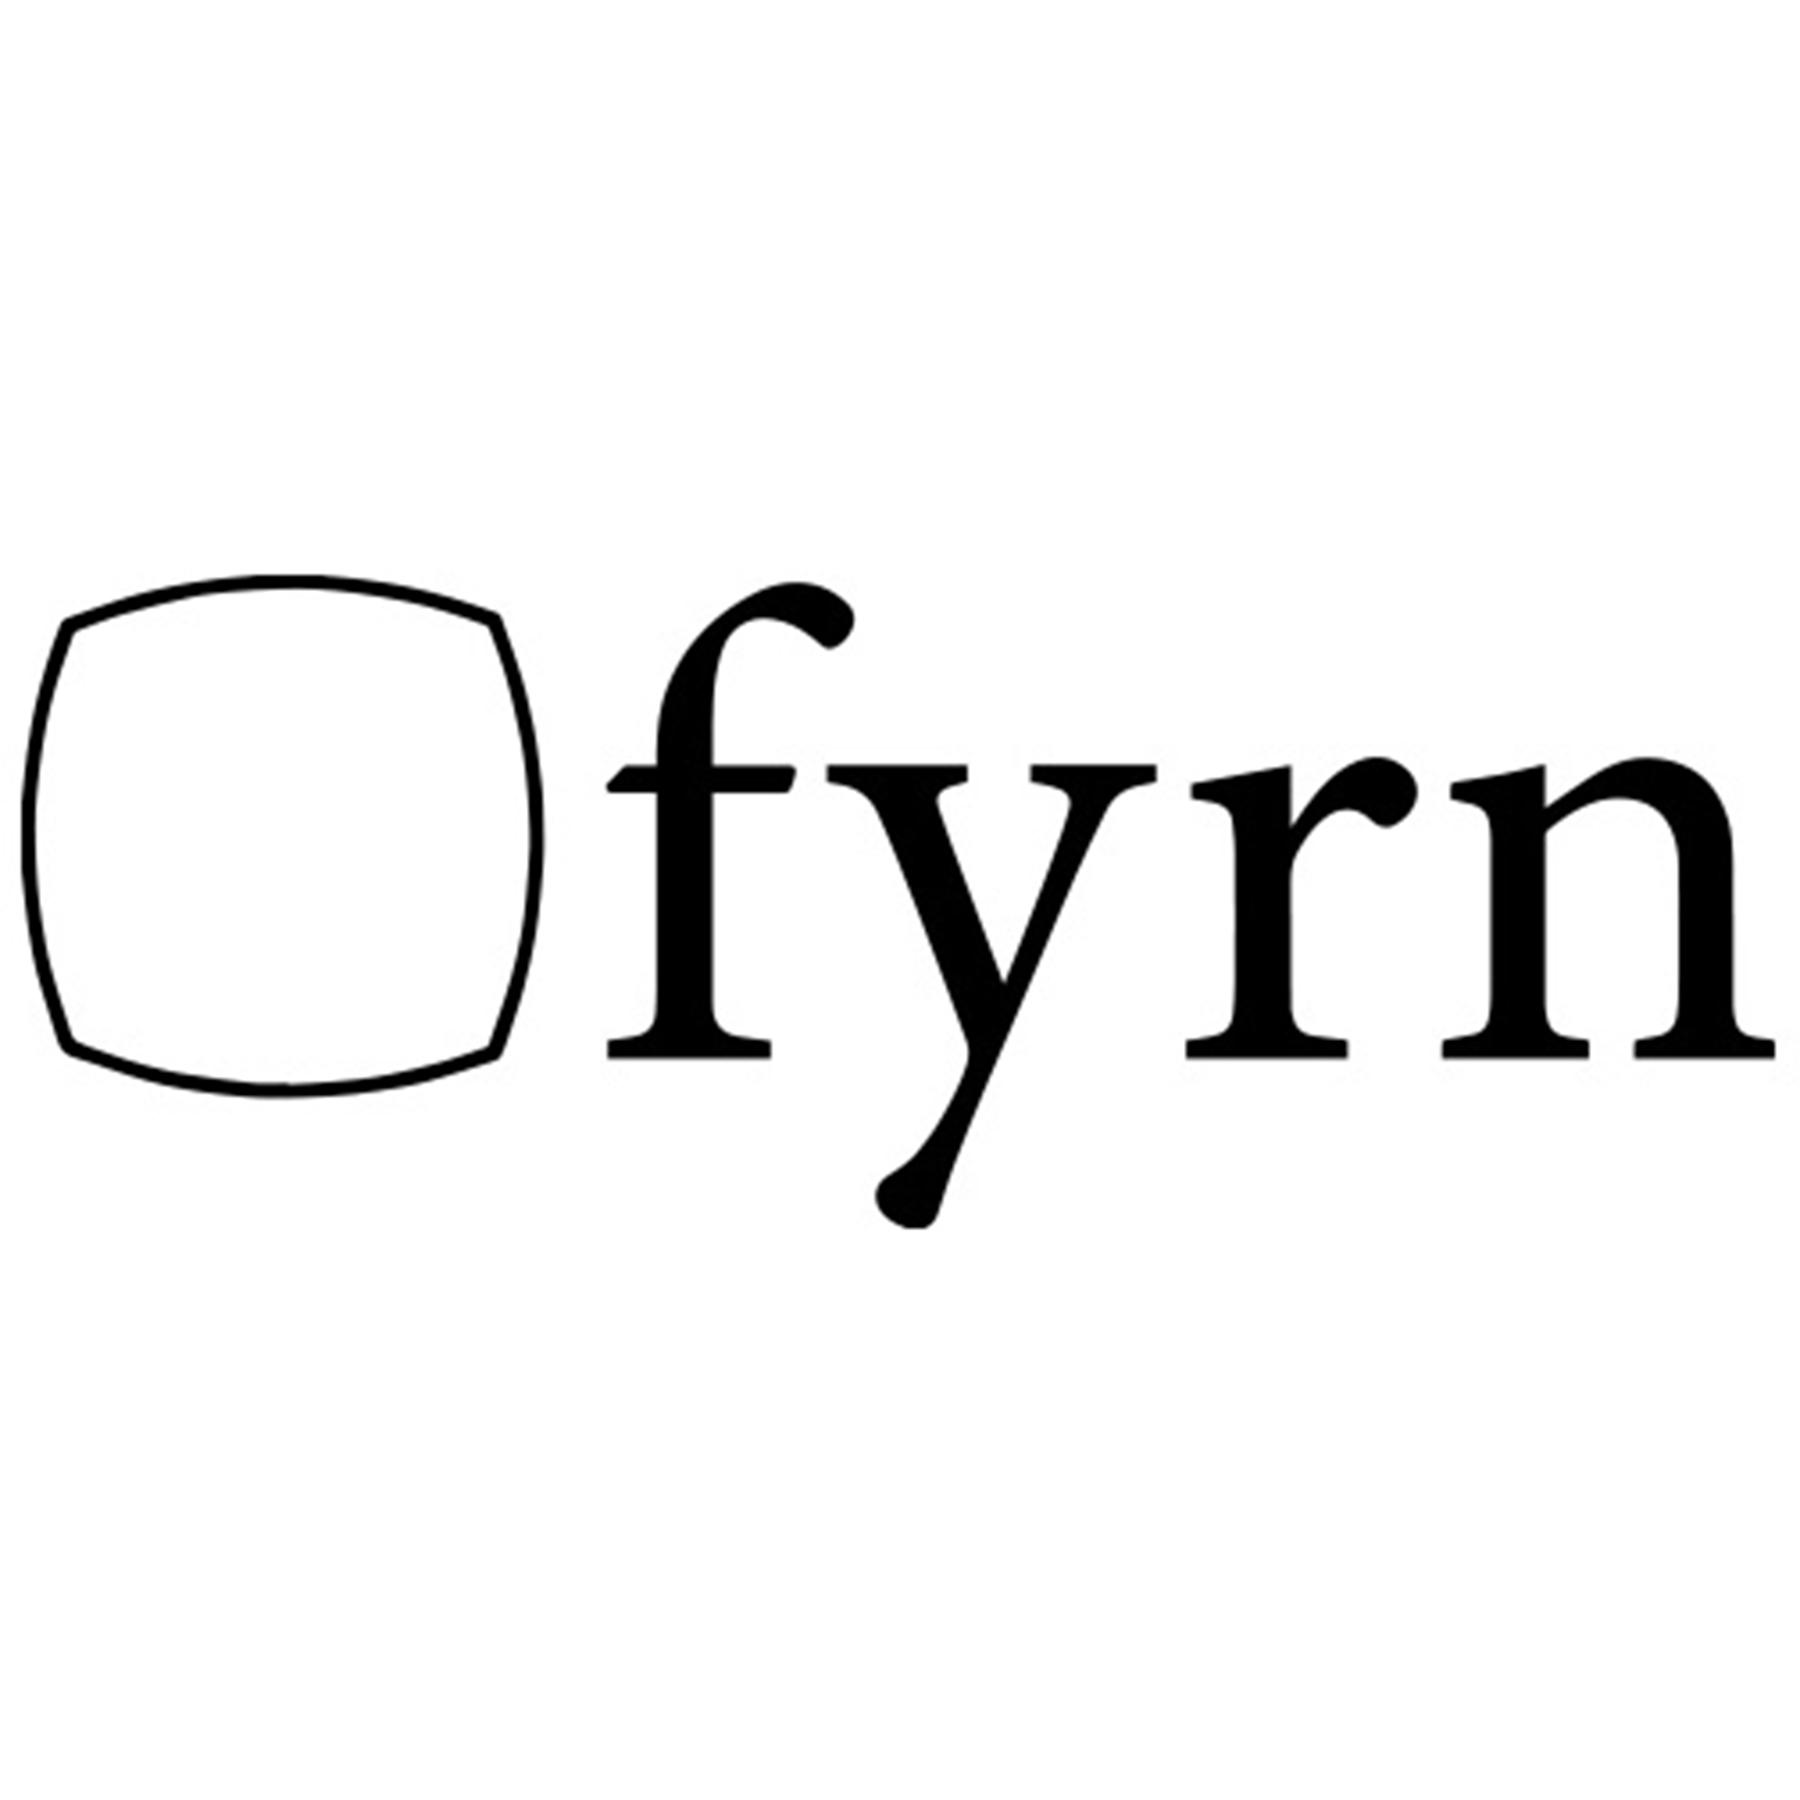 Fyrn Stemn Flat pack furniture